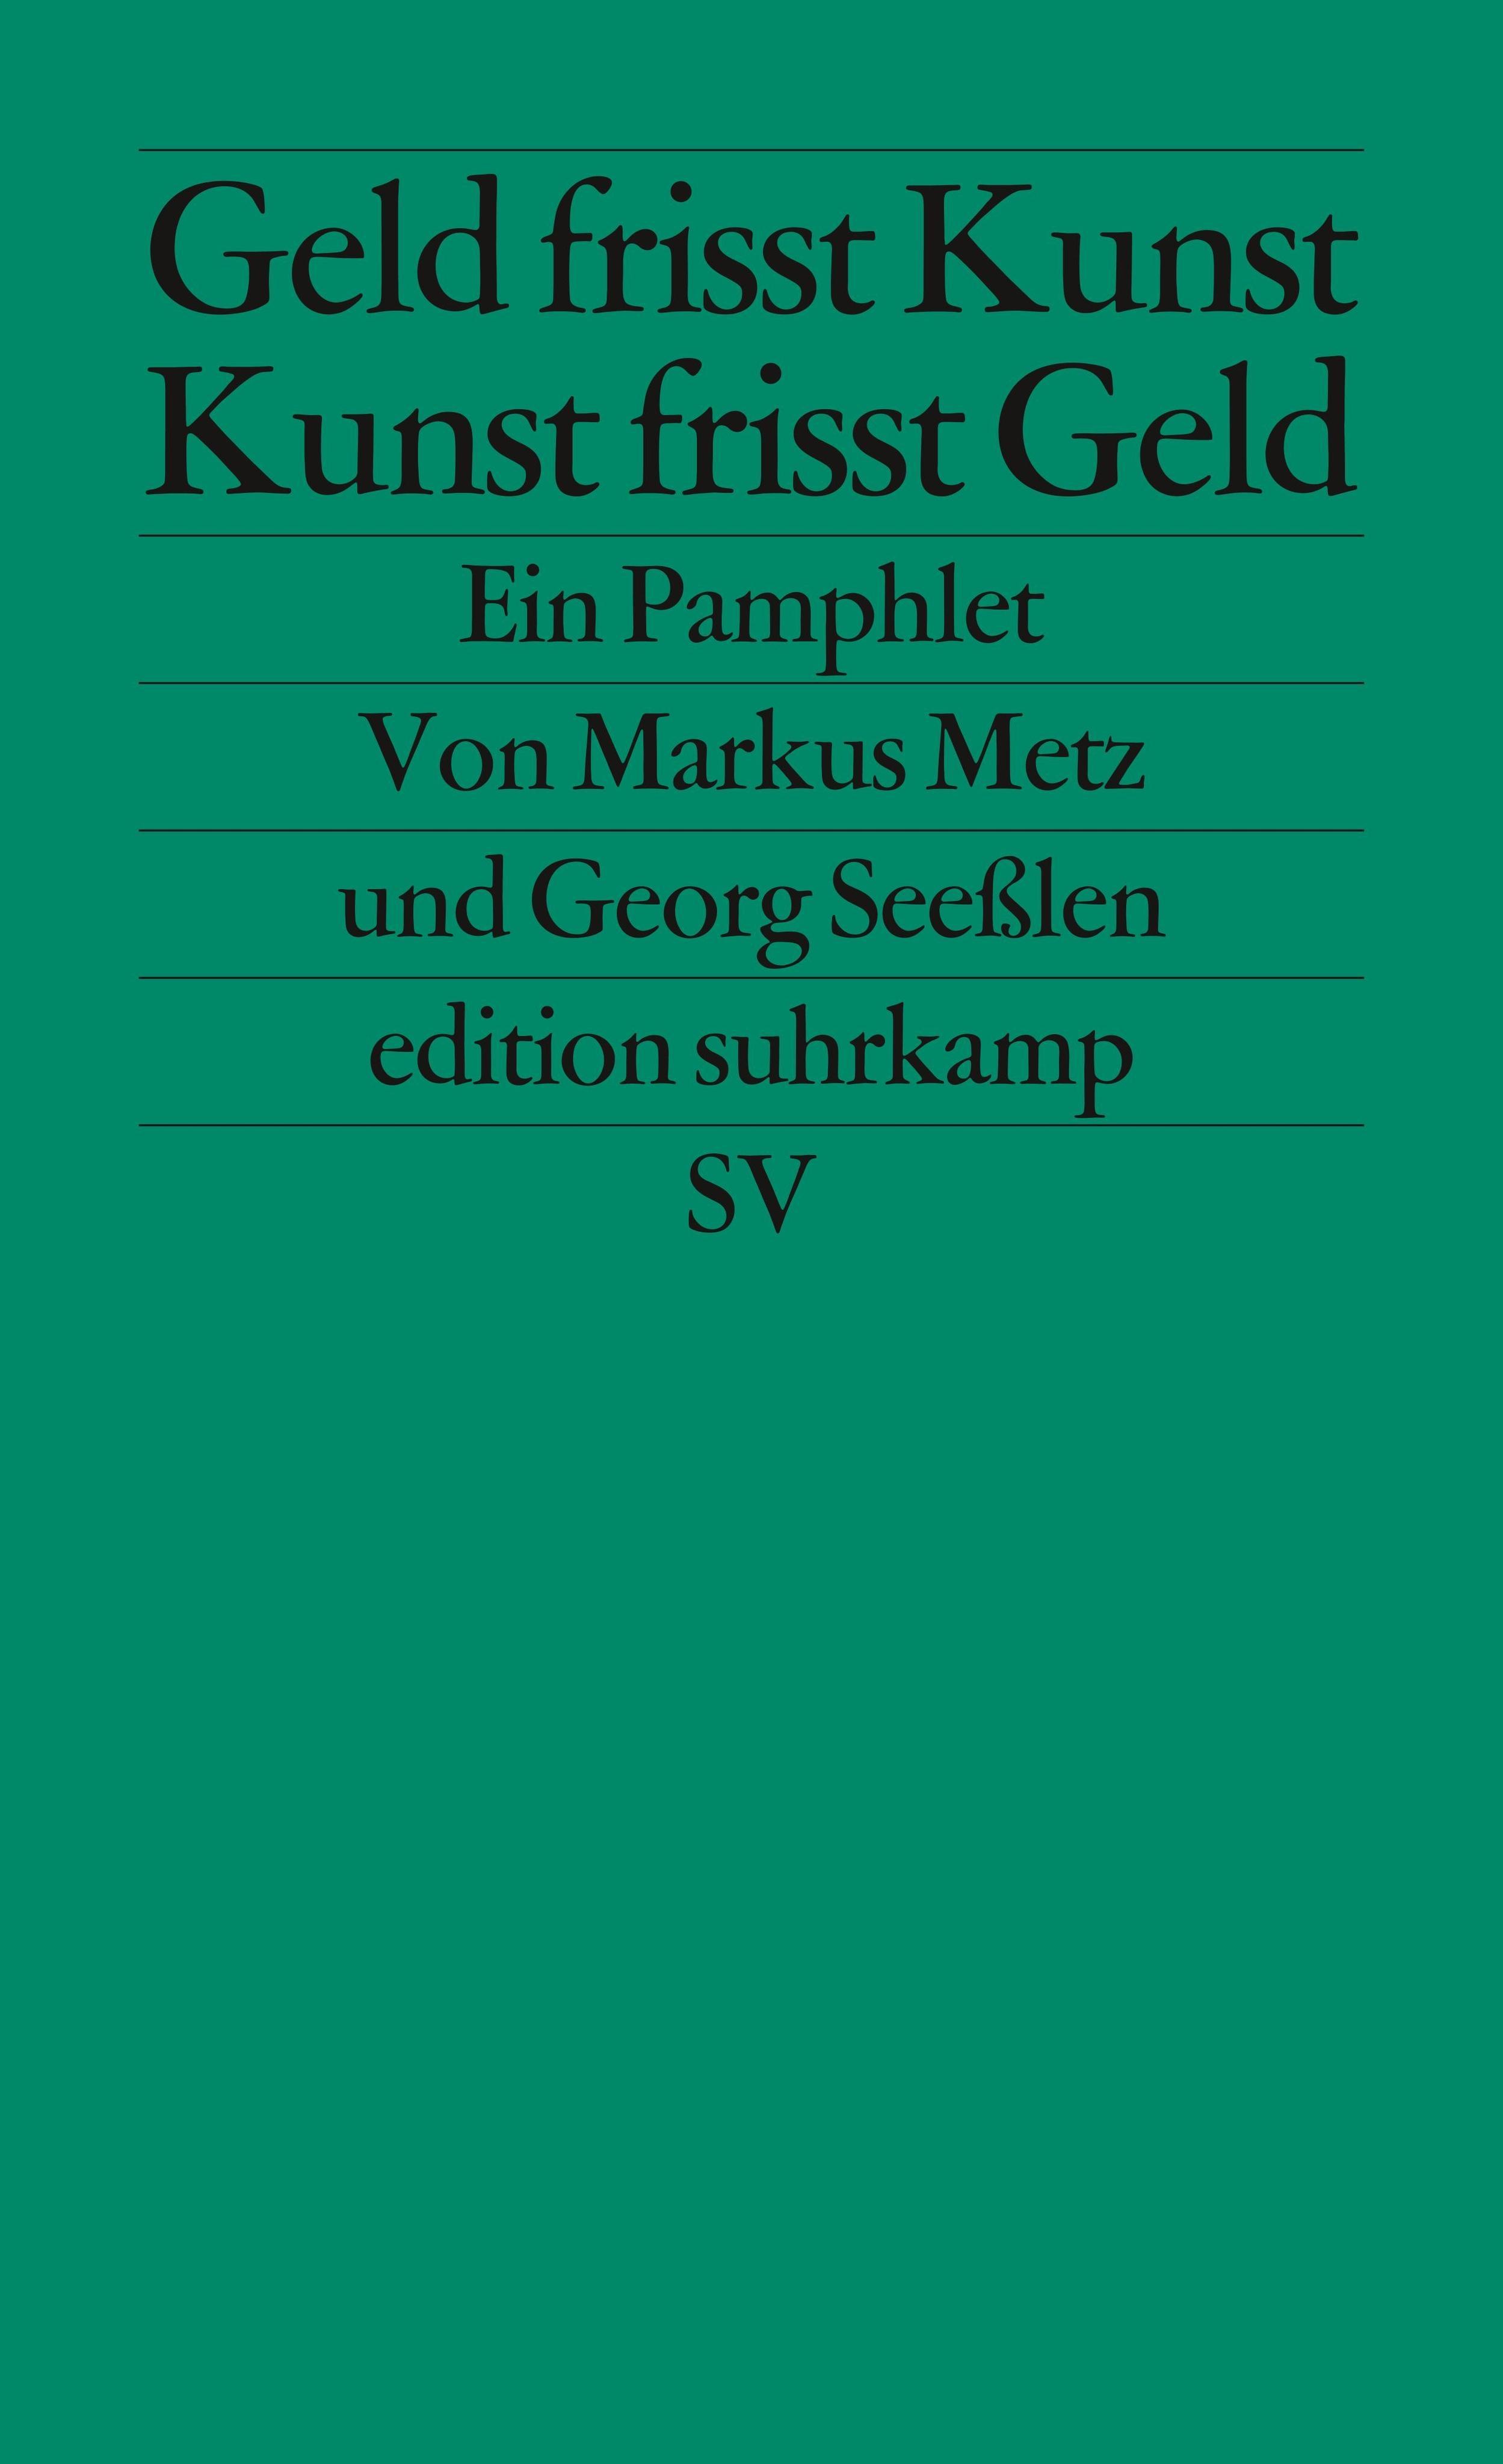 Markus Metz / Geld frisst Kunst - Kunst frisst Geld /  9783518126752